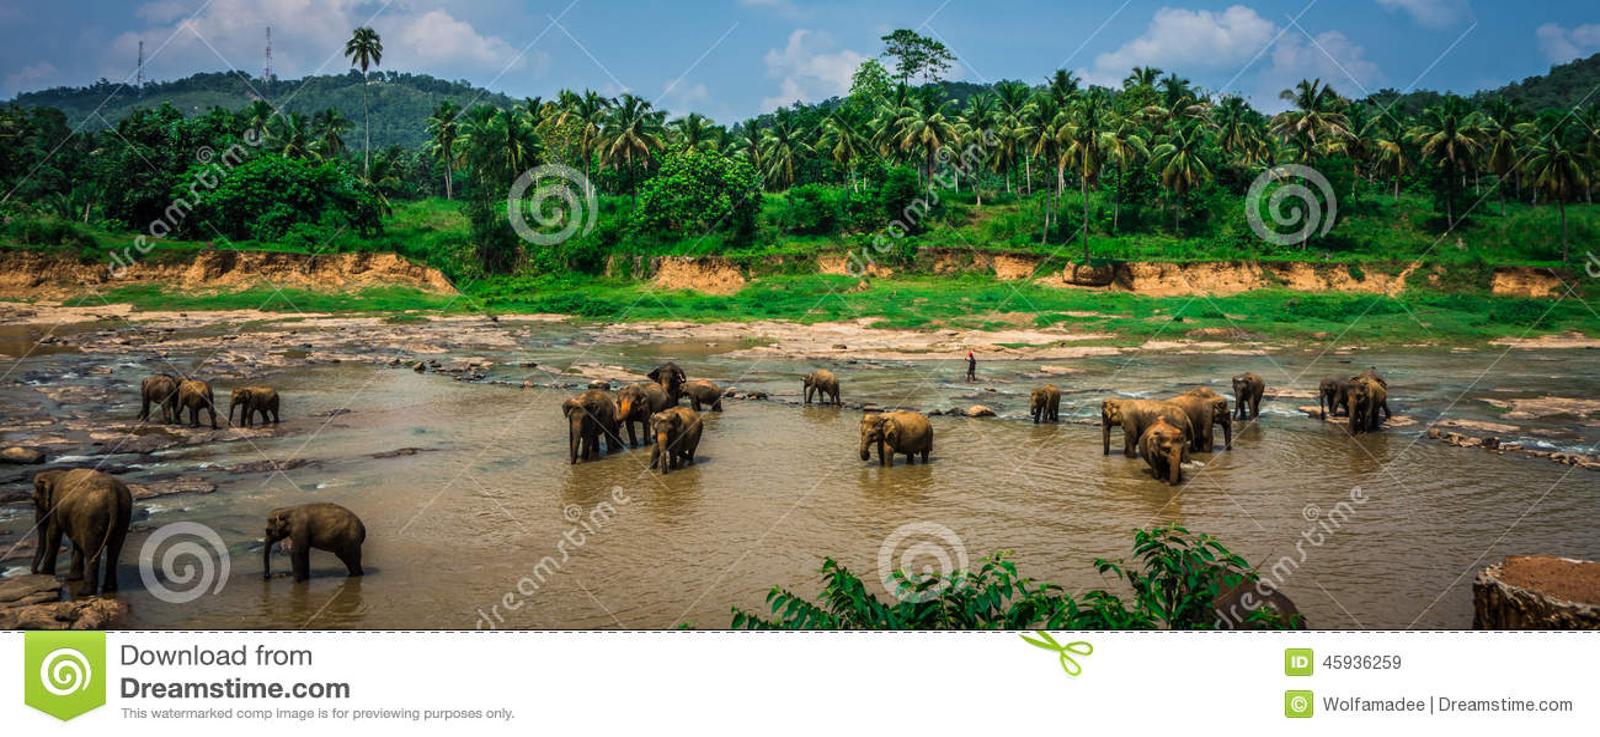 Elephant sanctuary in Sri Lanka